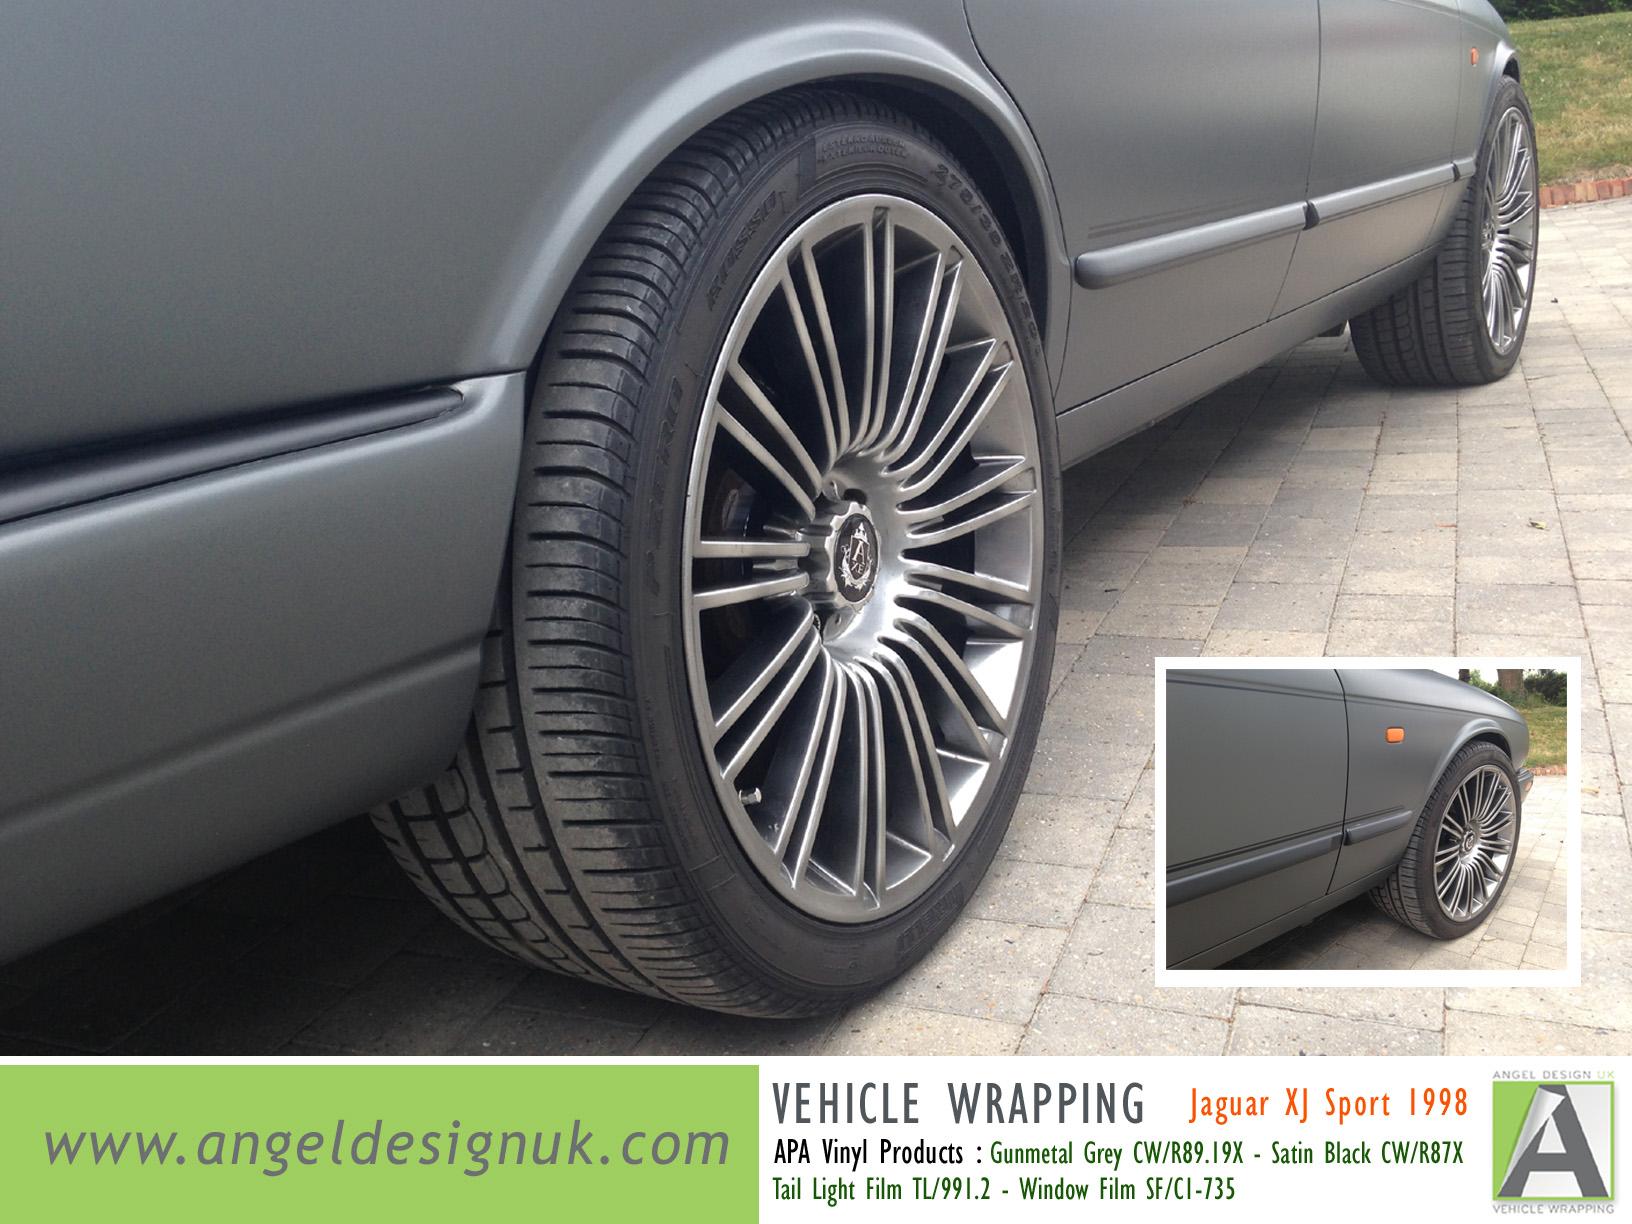 ANGEL DESIGN UK Vehicle Wrapping Jaguar XJ Sport 1998 Gunmetal Grey Pic 4